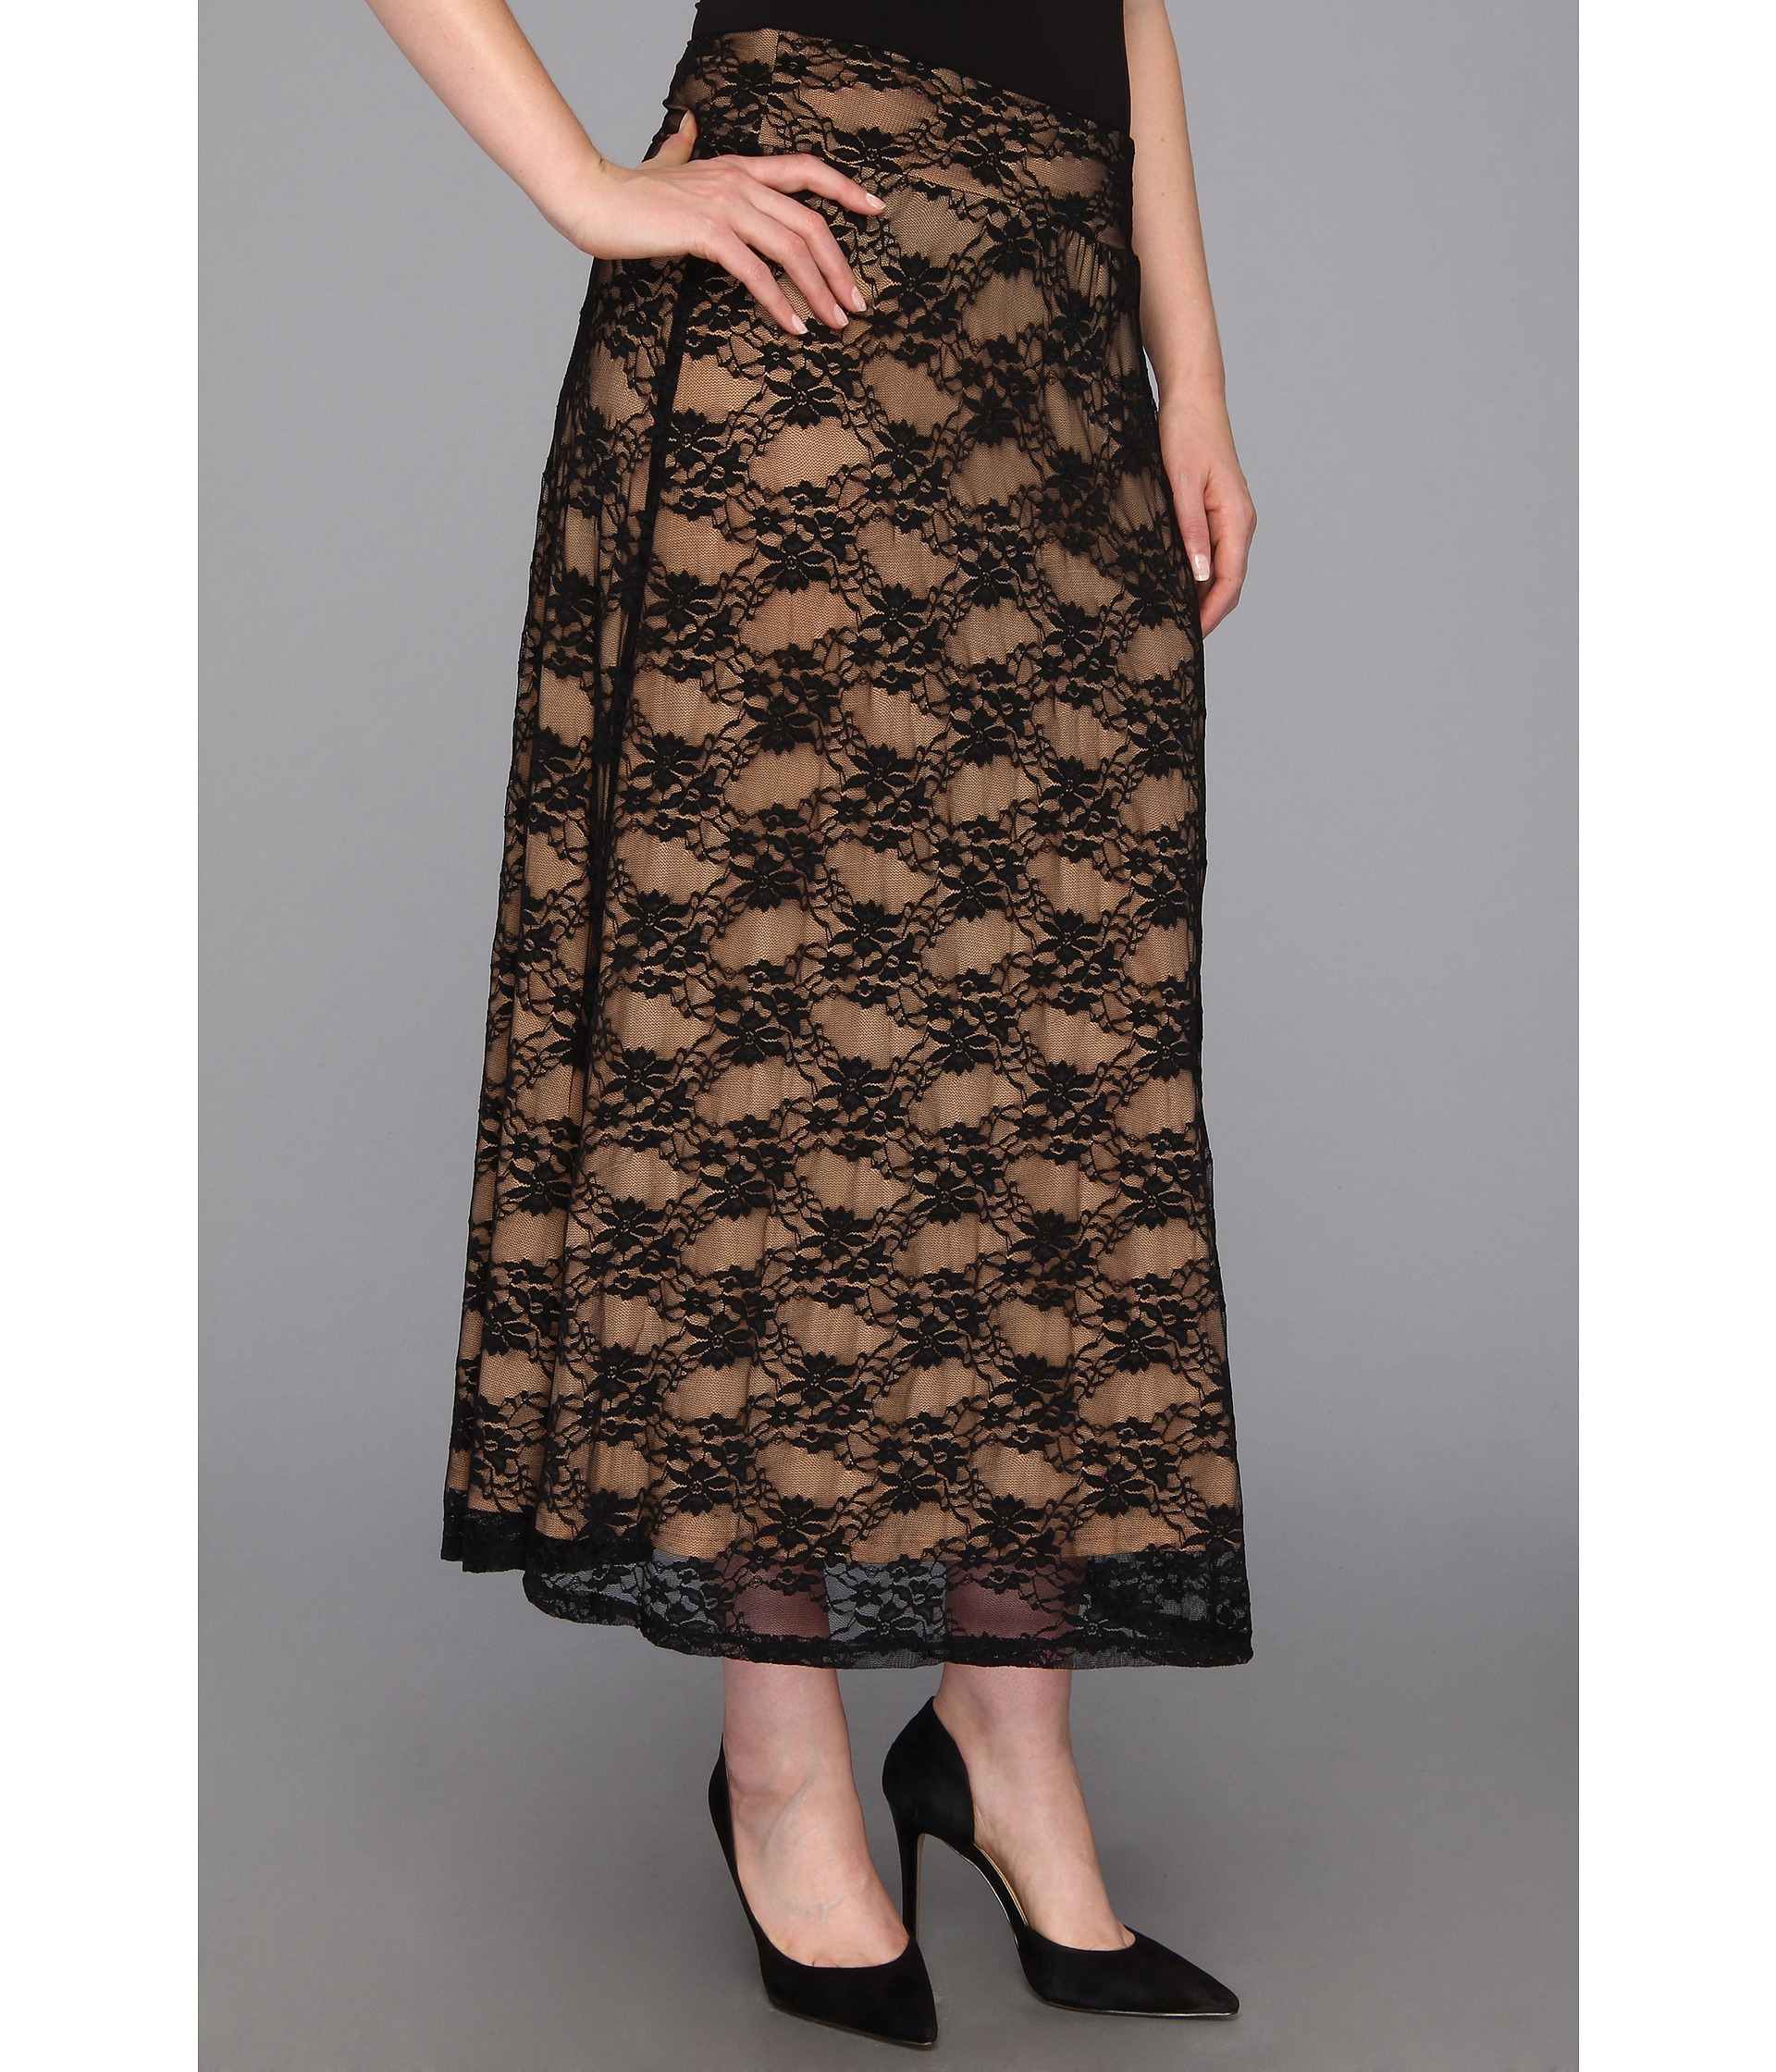 plus plus size lace maxi skirt shipped free